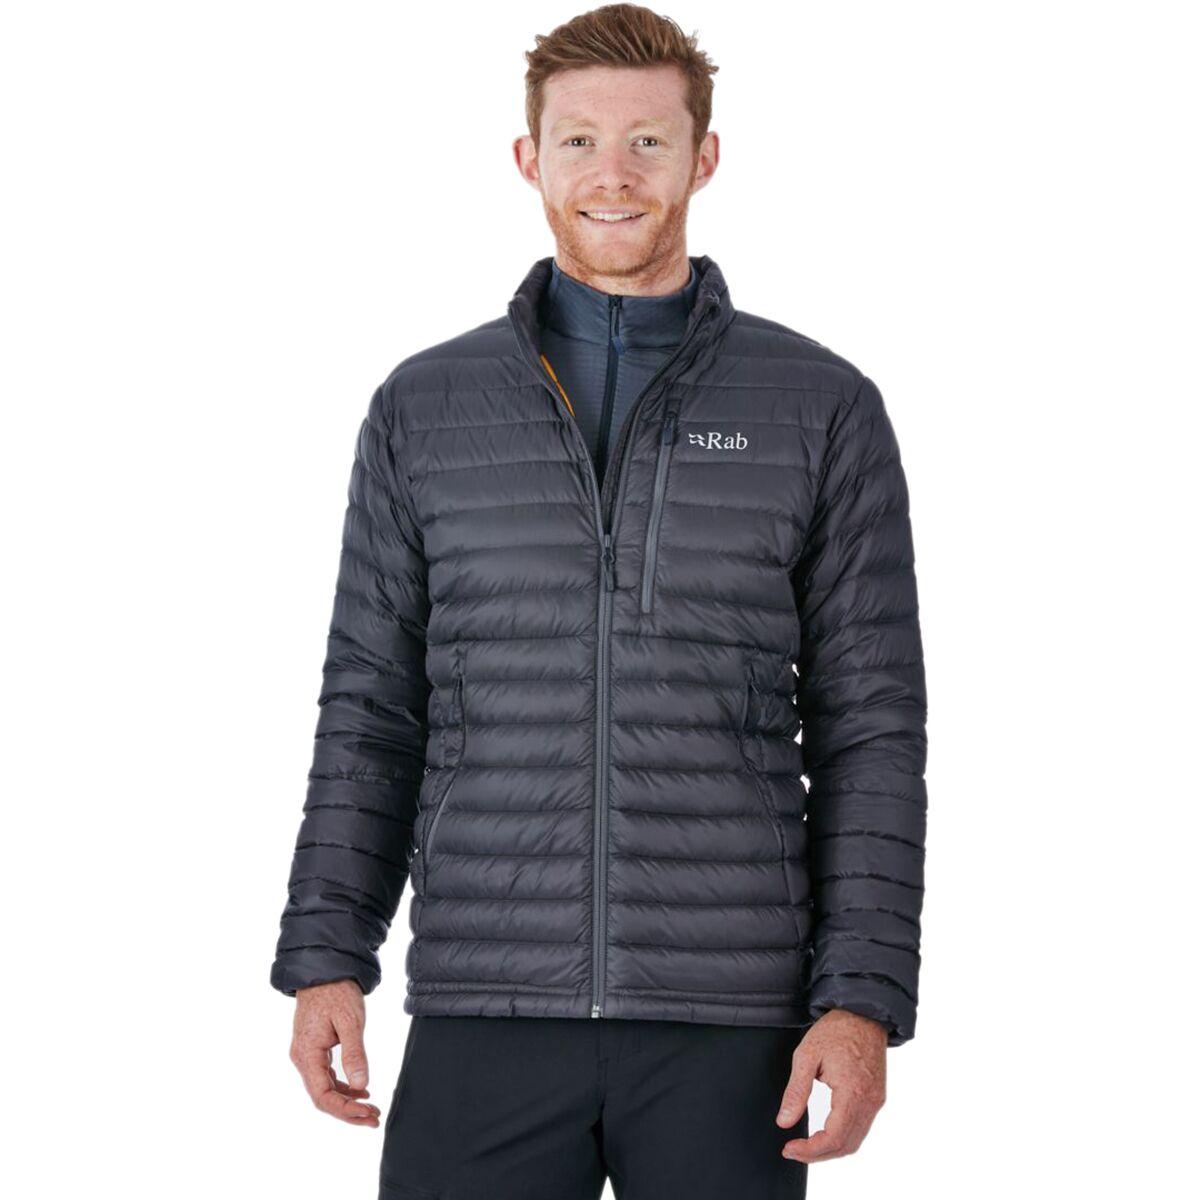 Rab Microlight Jacket